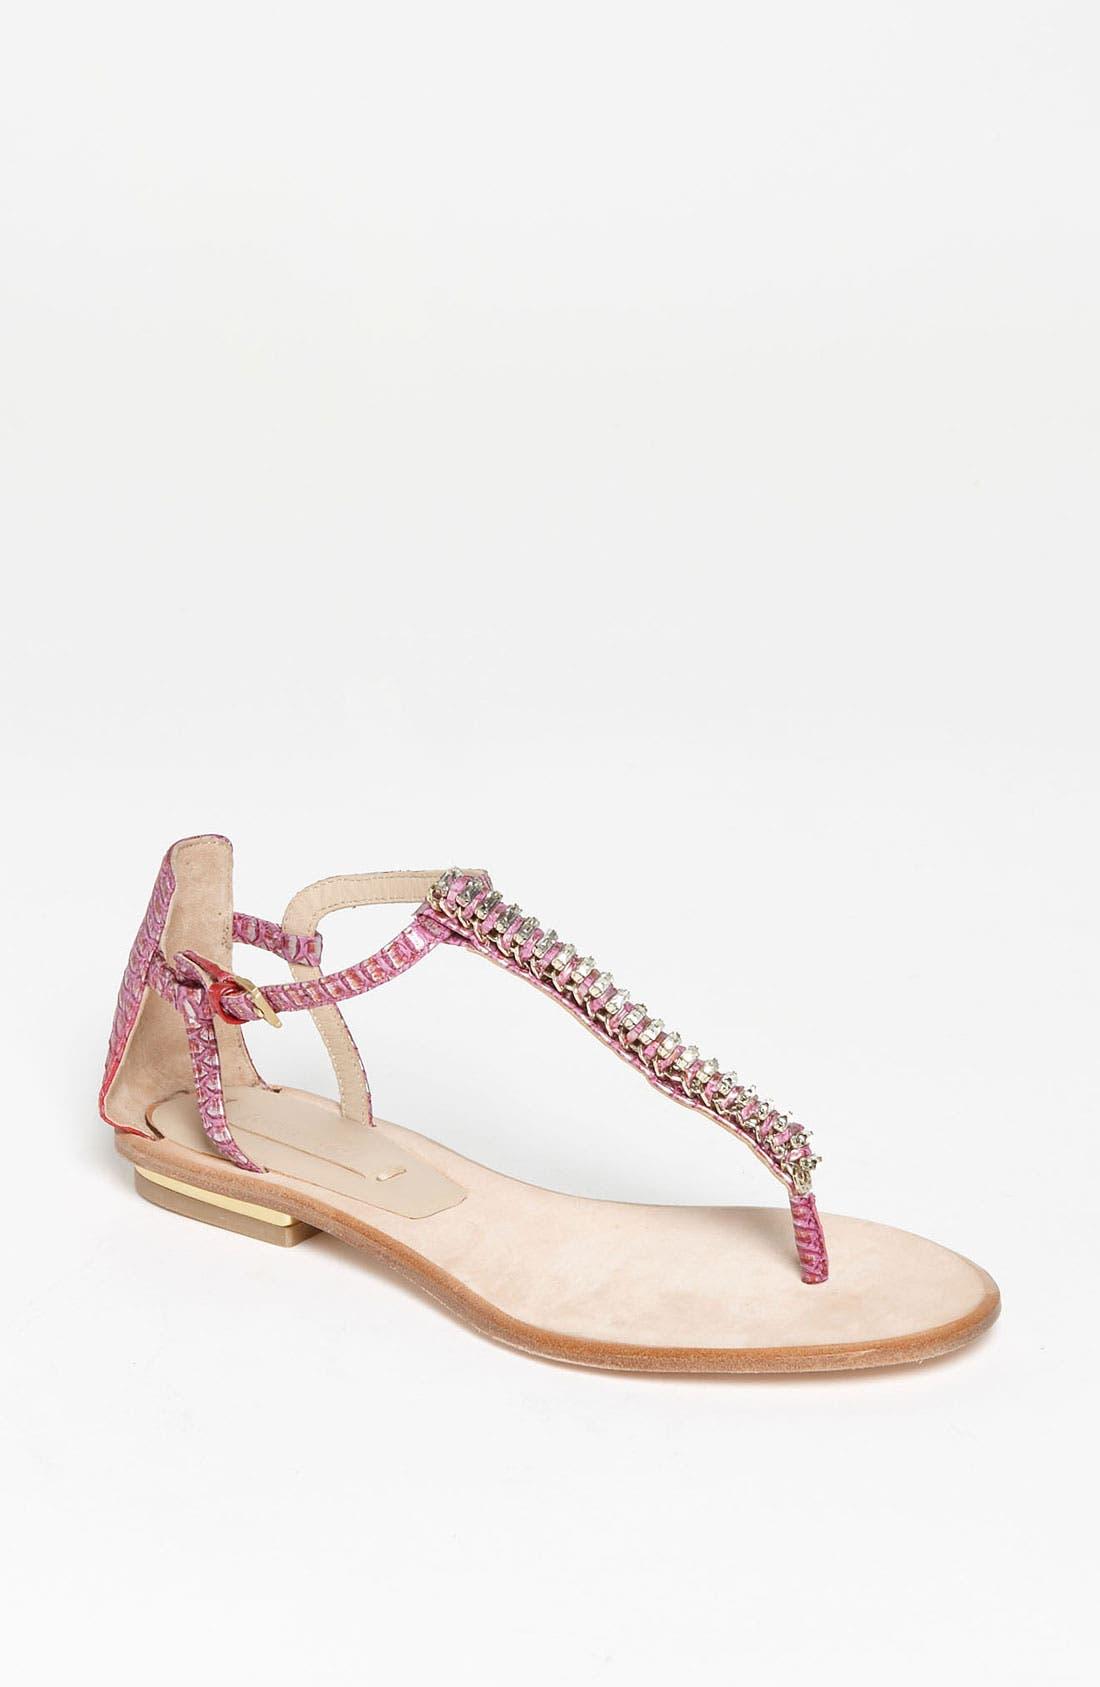 Main Image - Rachel Roy 'Carina' Sandal